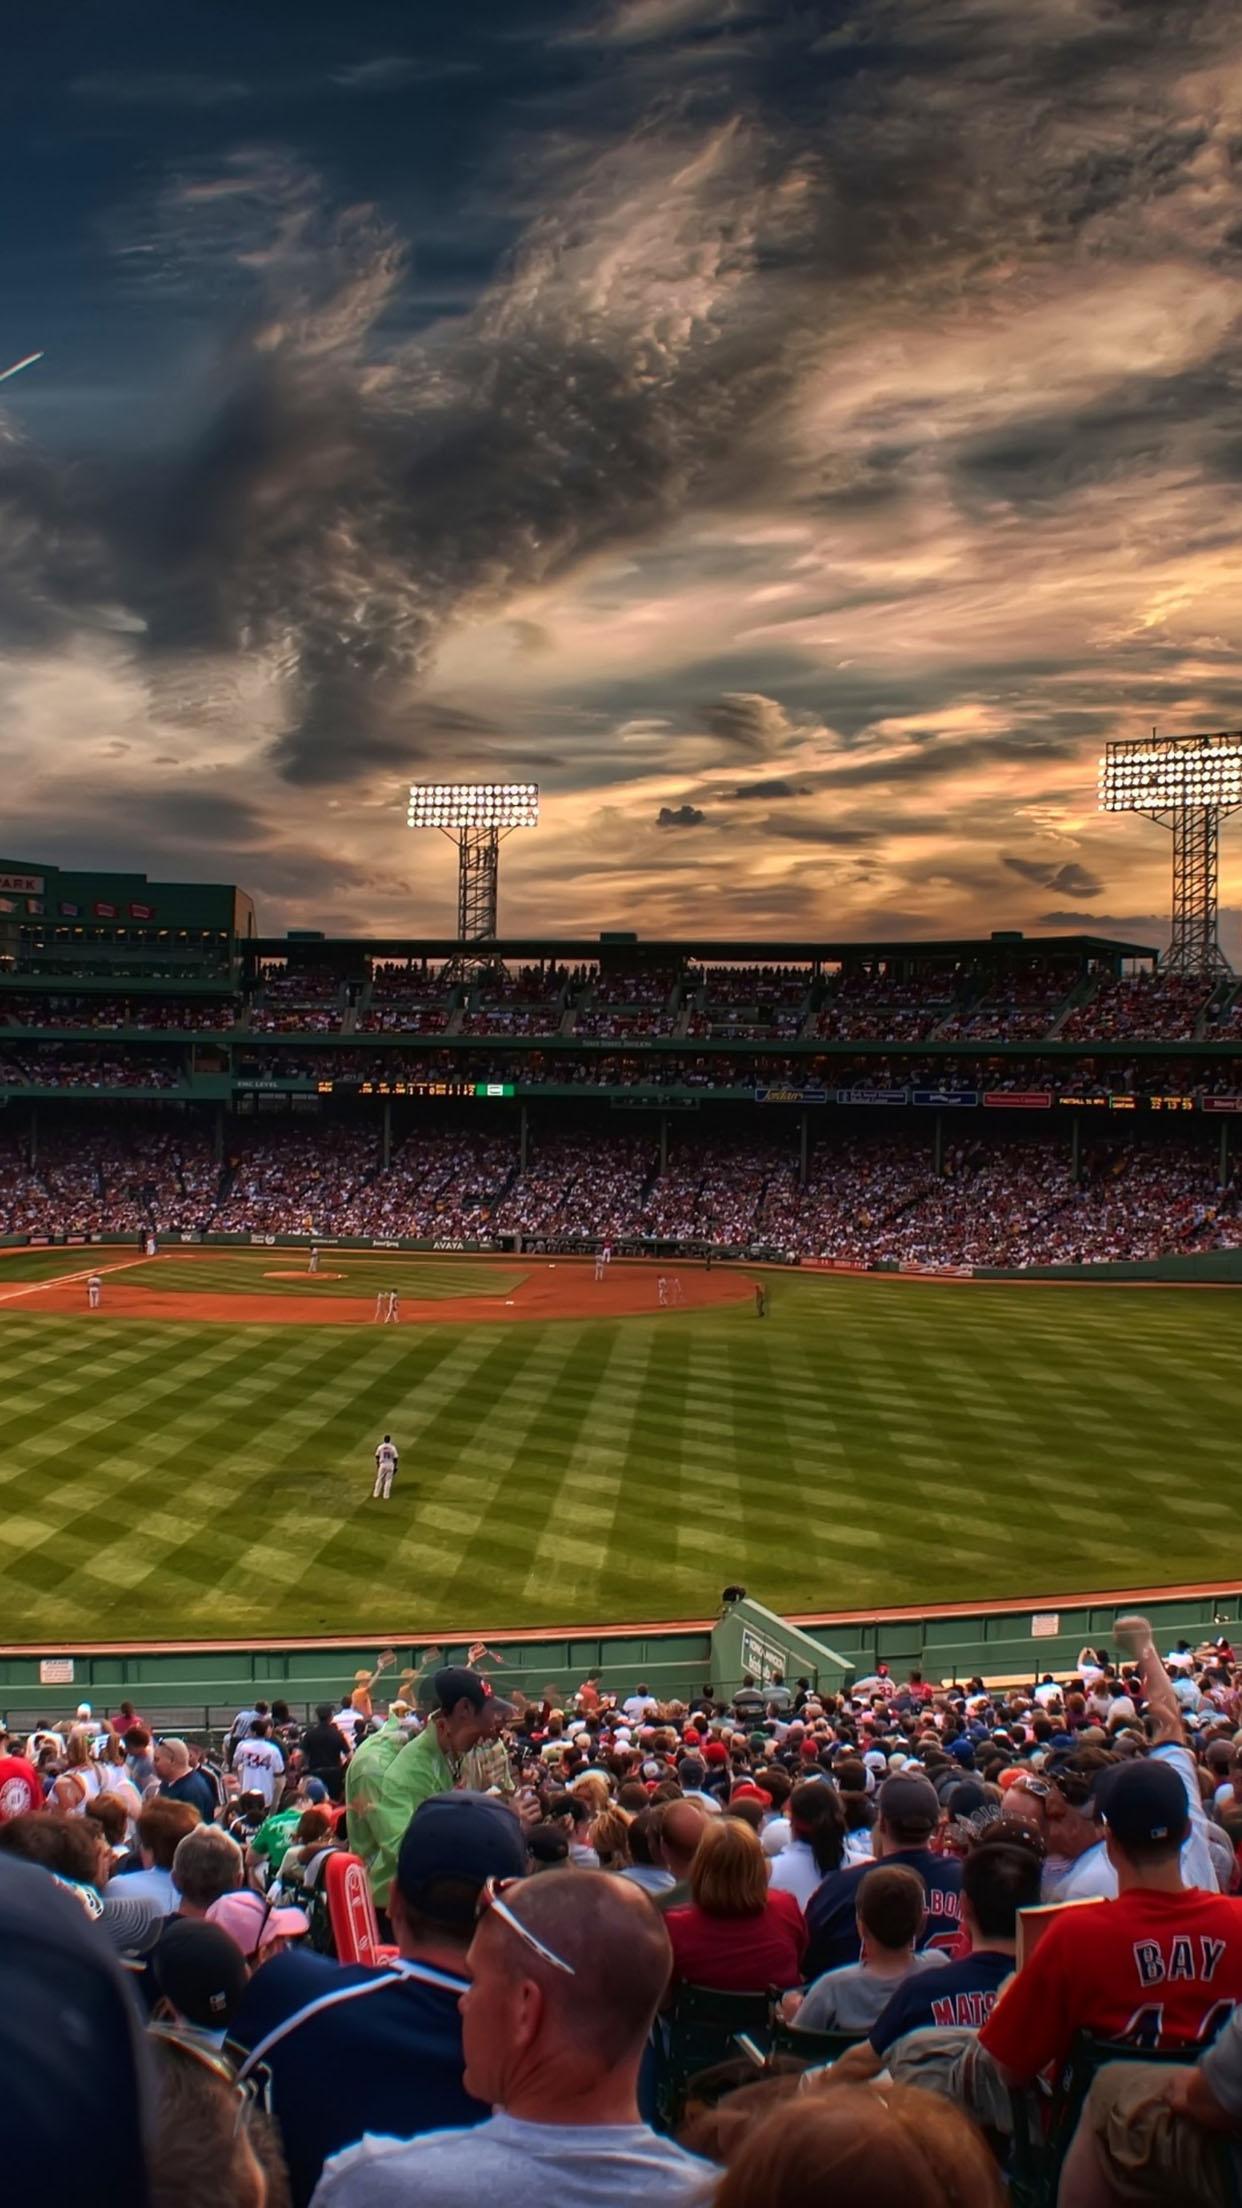 Boston Hd Wallpaper Baseball Stadium Wallpaper For Iphone X 8 7 6 Free